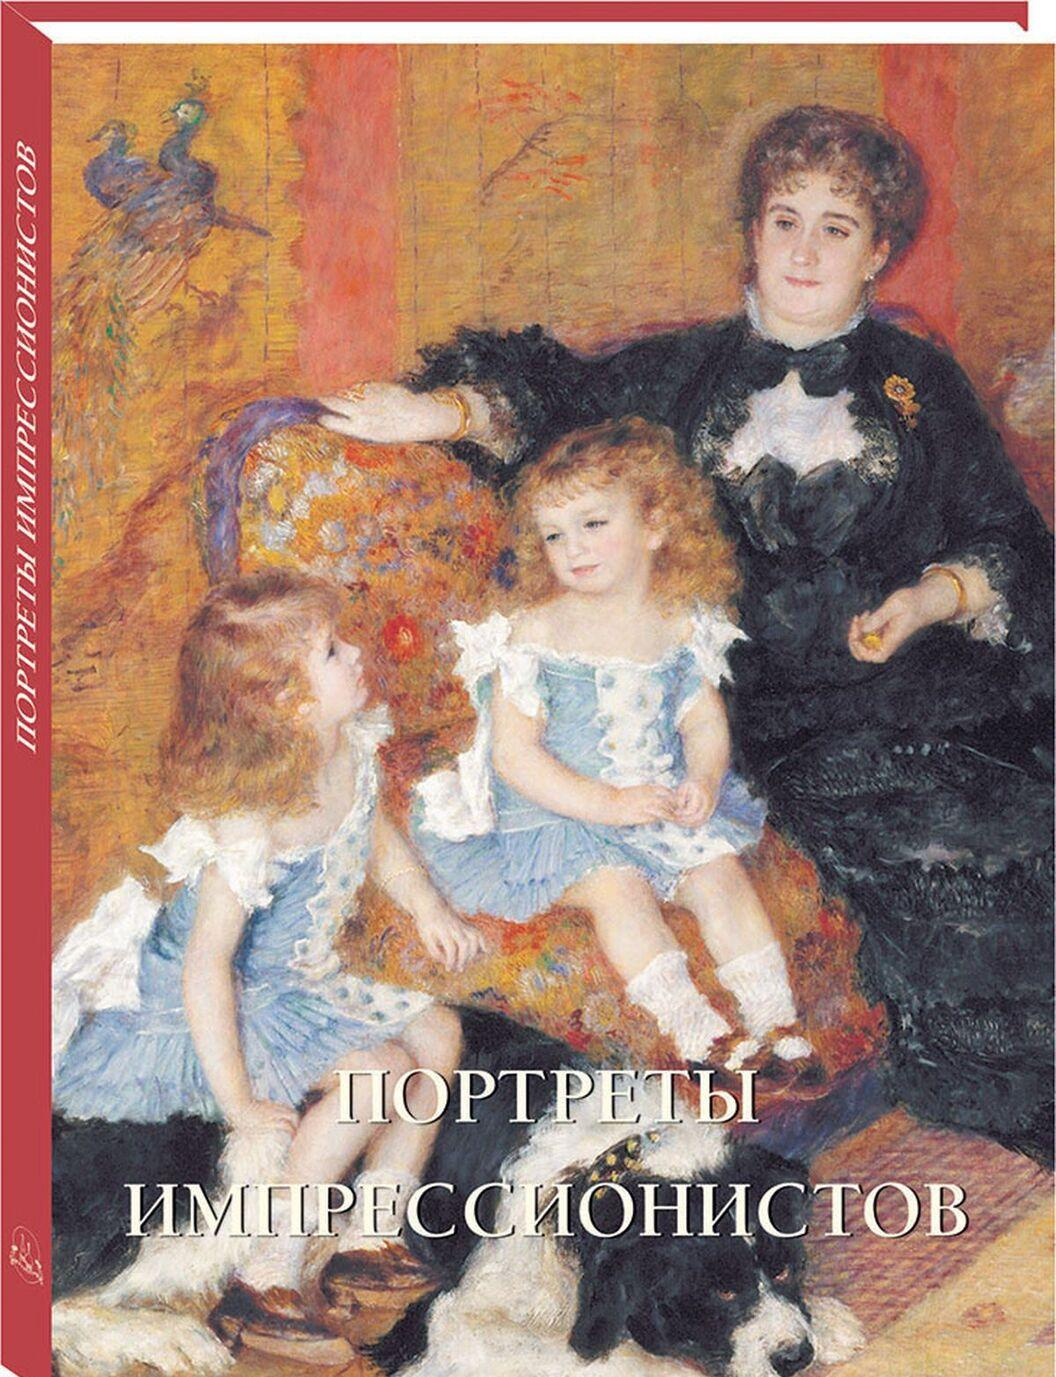 Portrety impressionistov | Butromeev Vladimir Petrovich